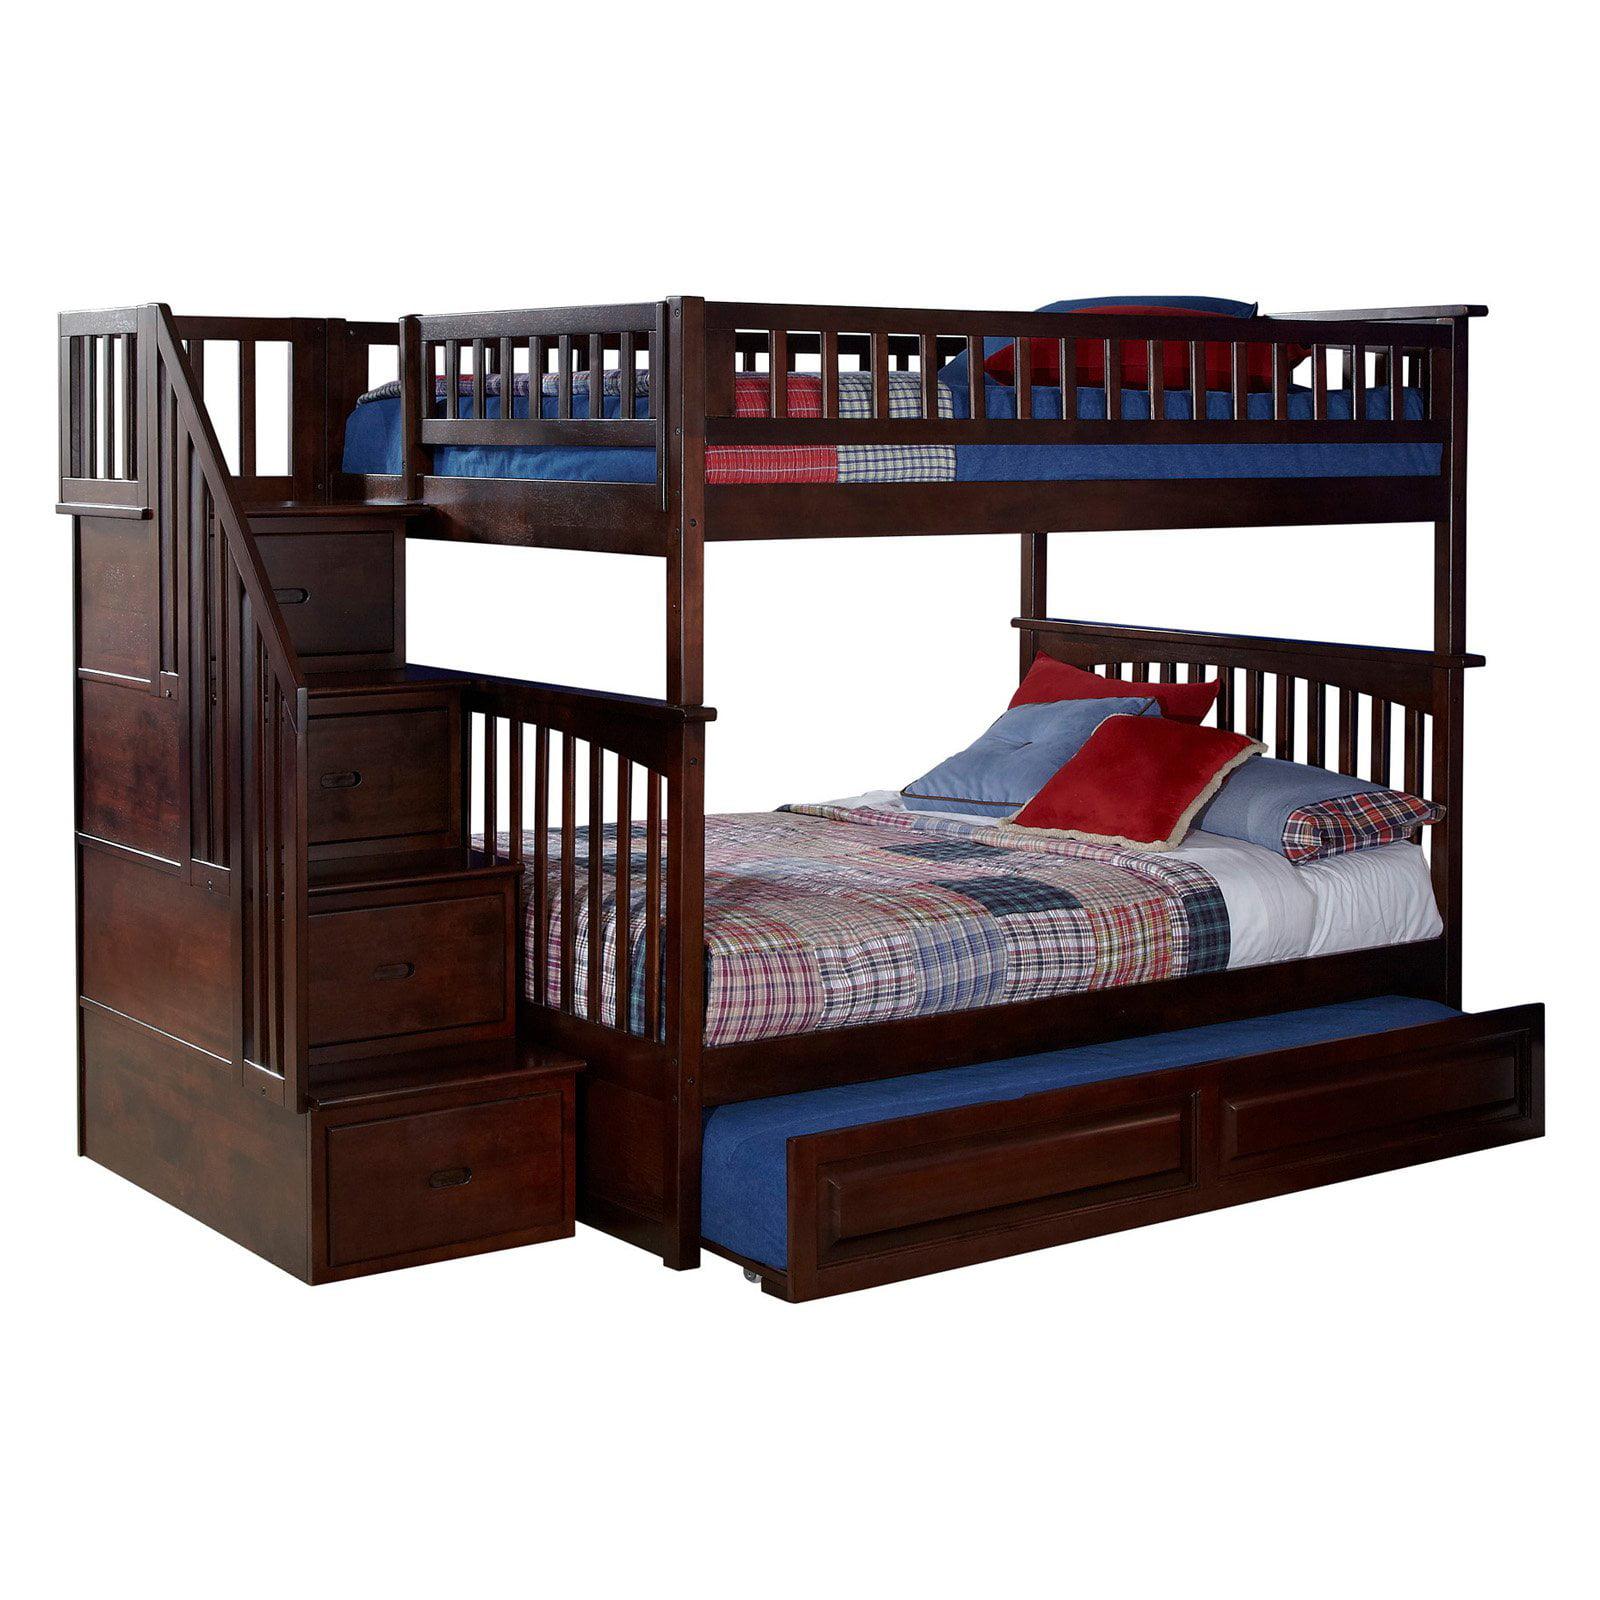 Atlantic Furniture Columbia Staircase Full Over Full Bunk Bed   Walmart.com